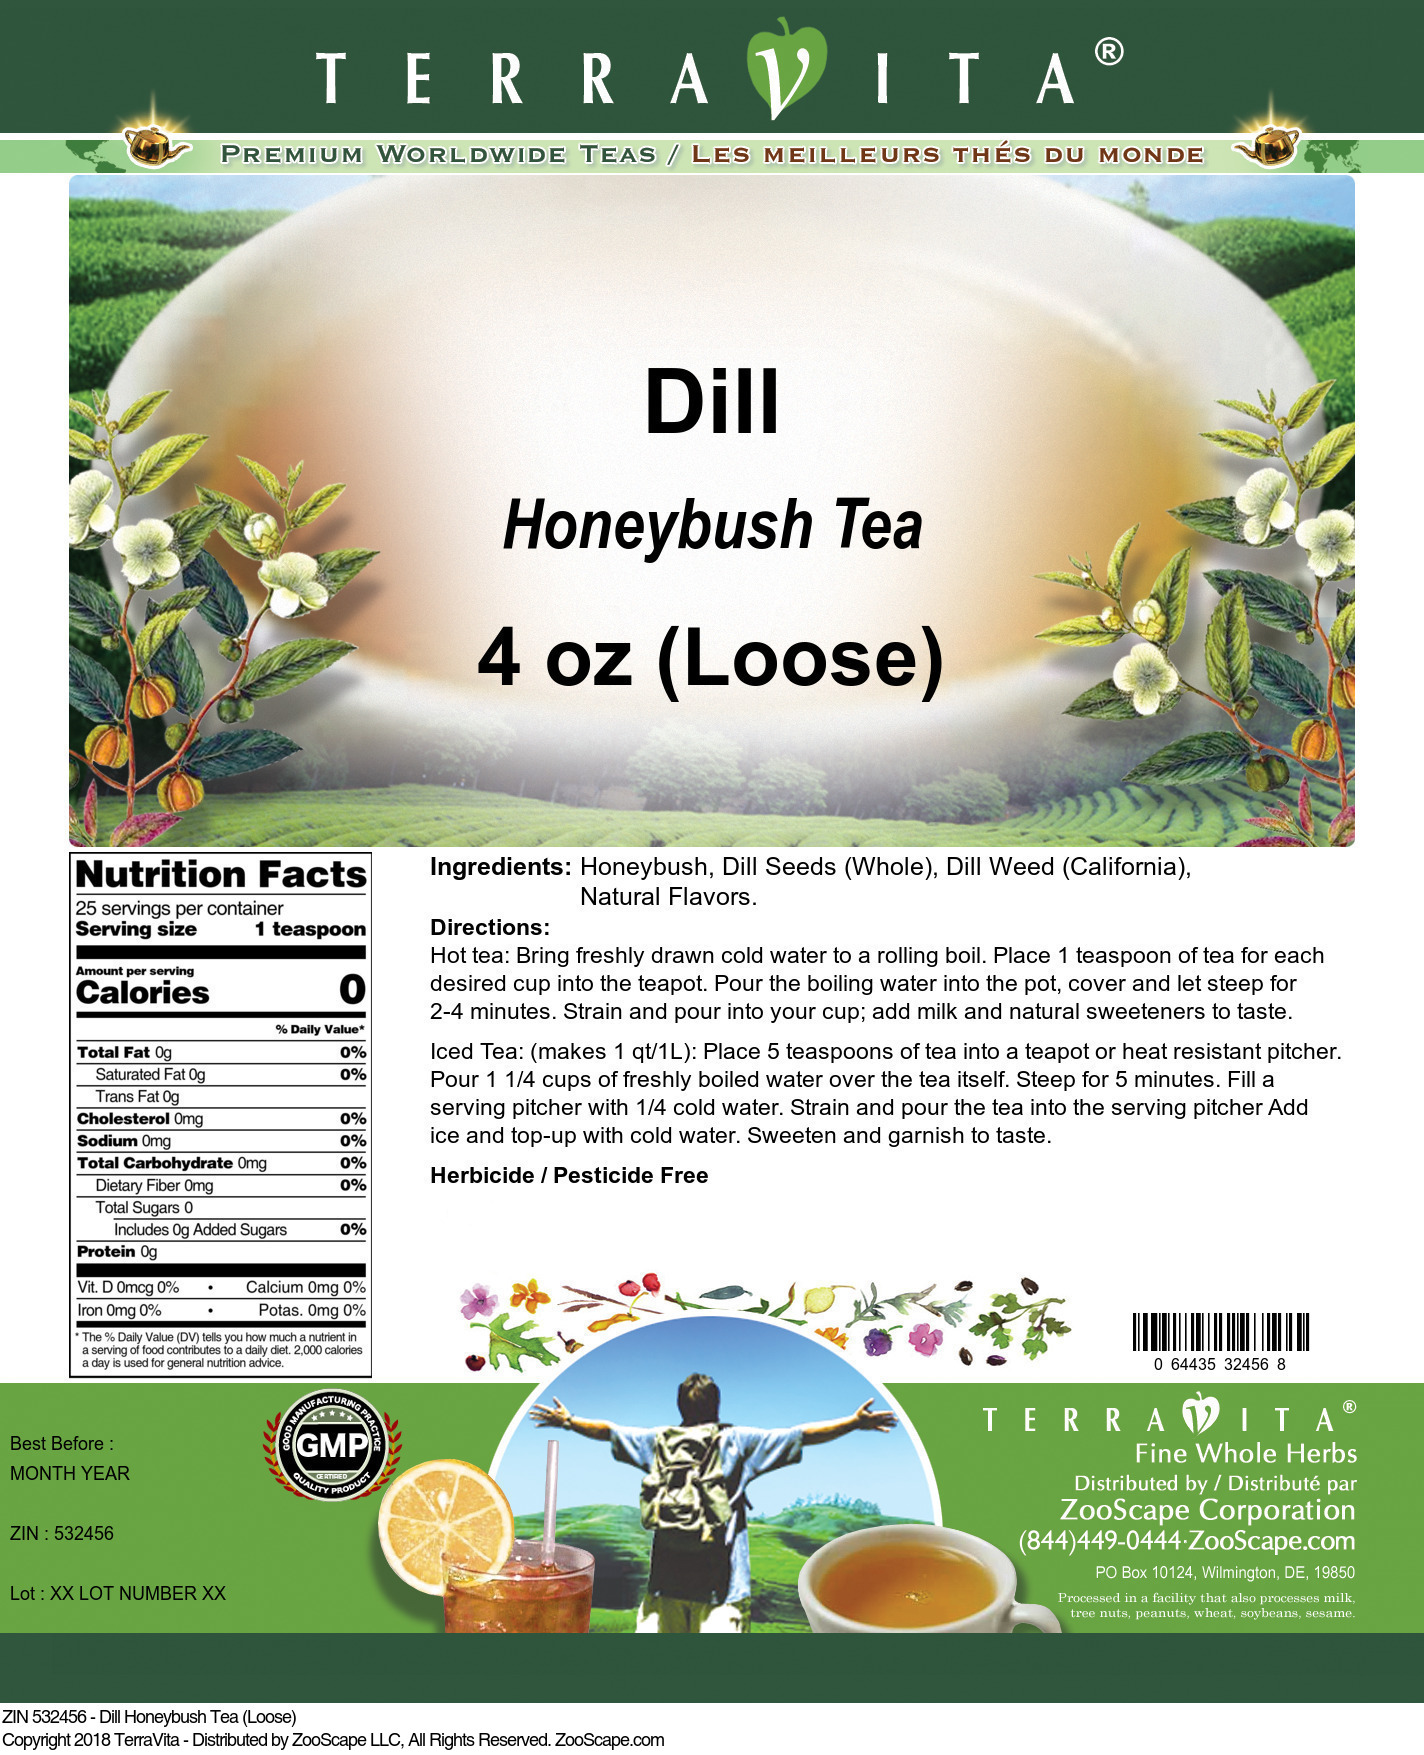 Dill Honeybush Tea